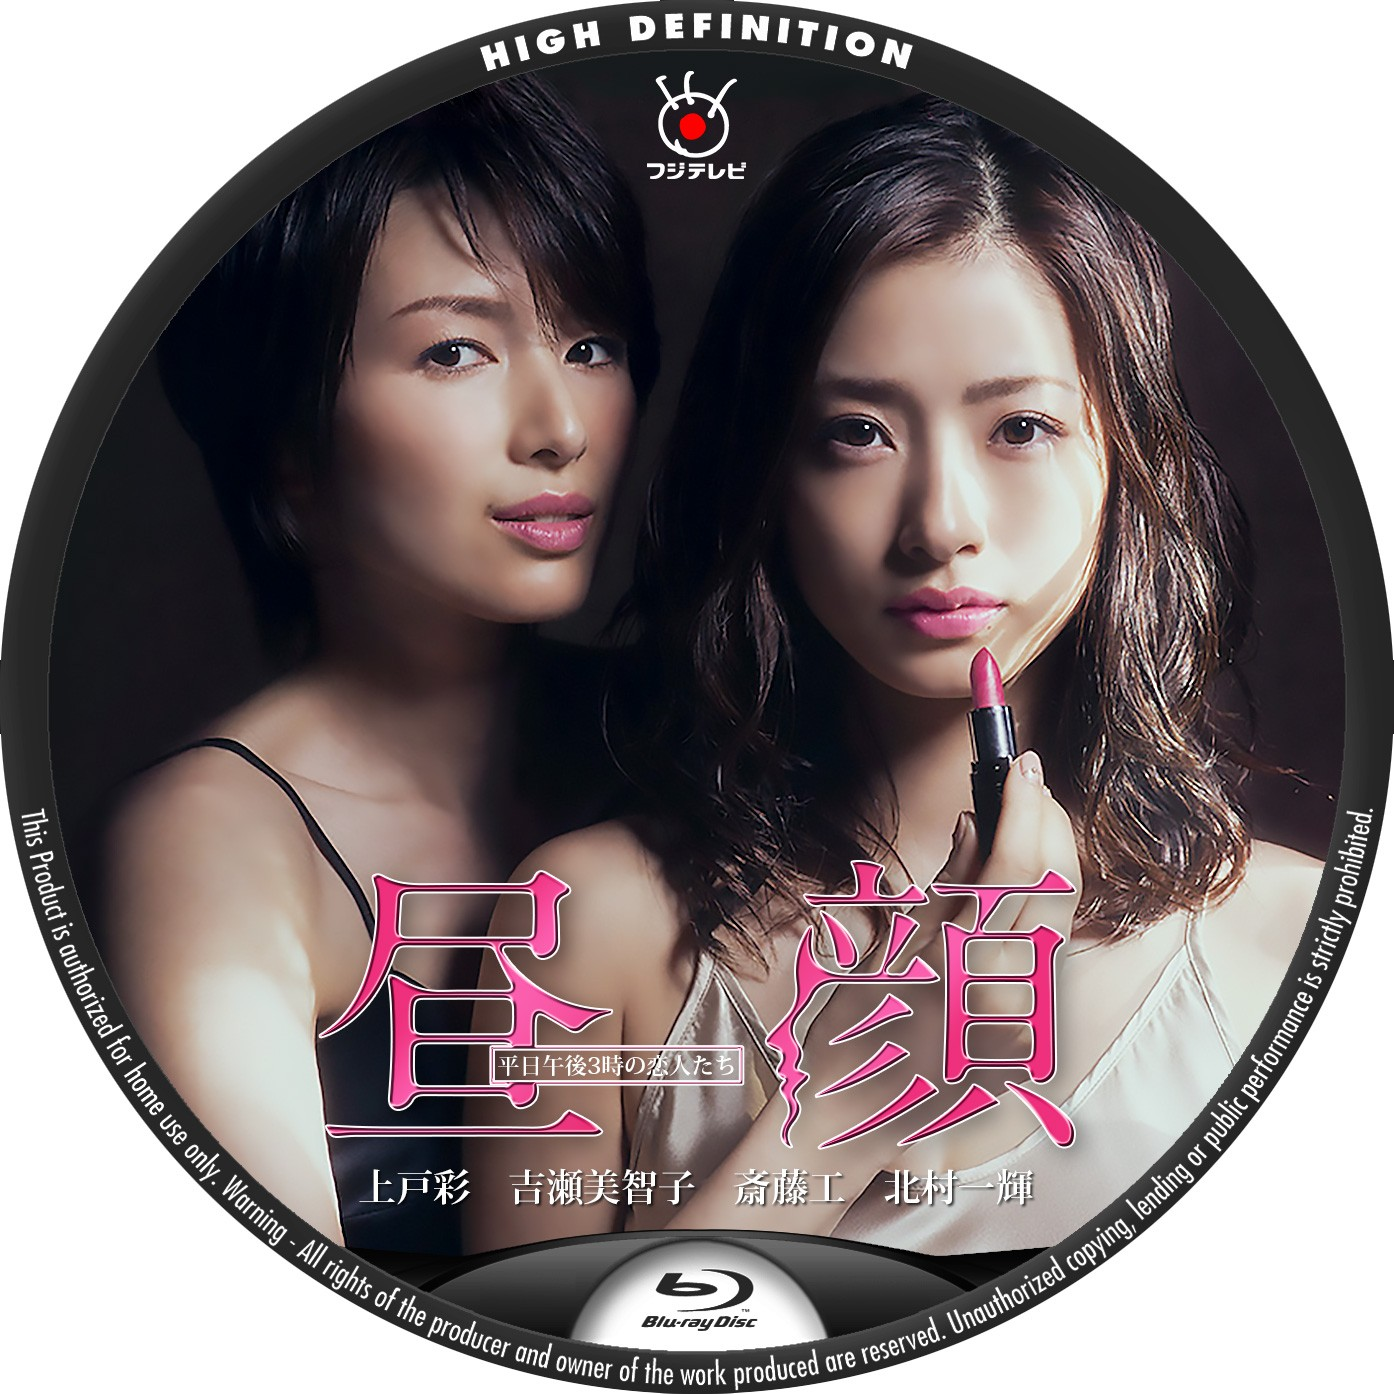 昼顔 BD Blu-rayラベル 上戸彩 吉瀬美智子